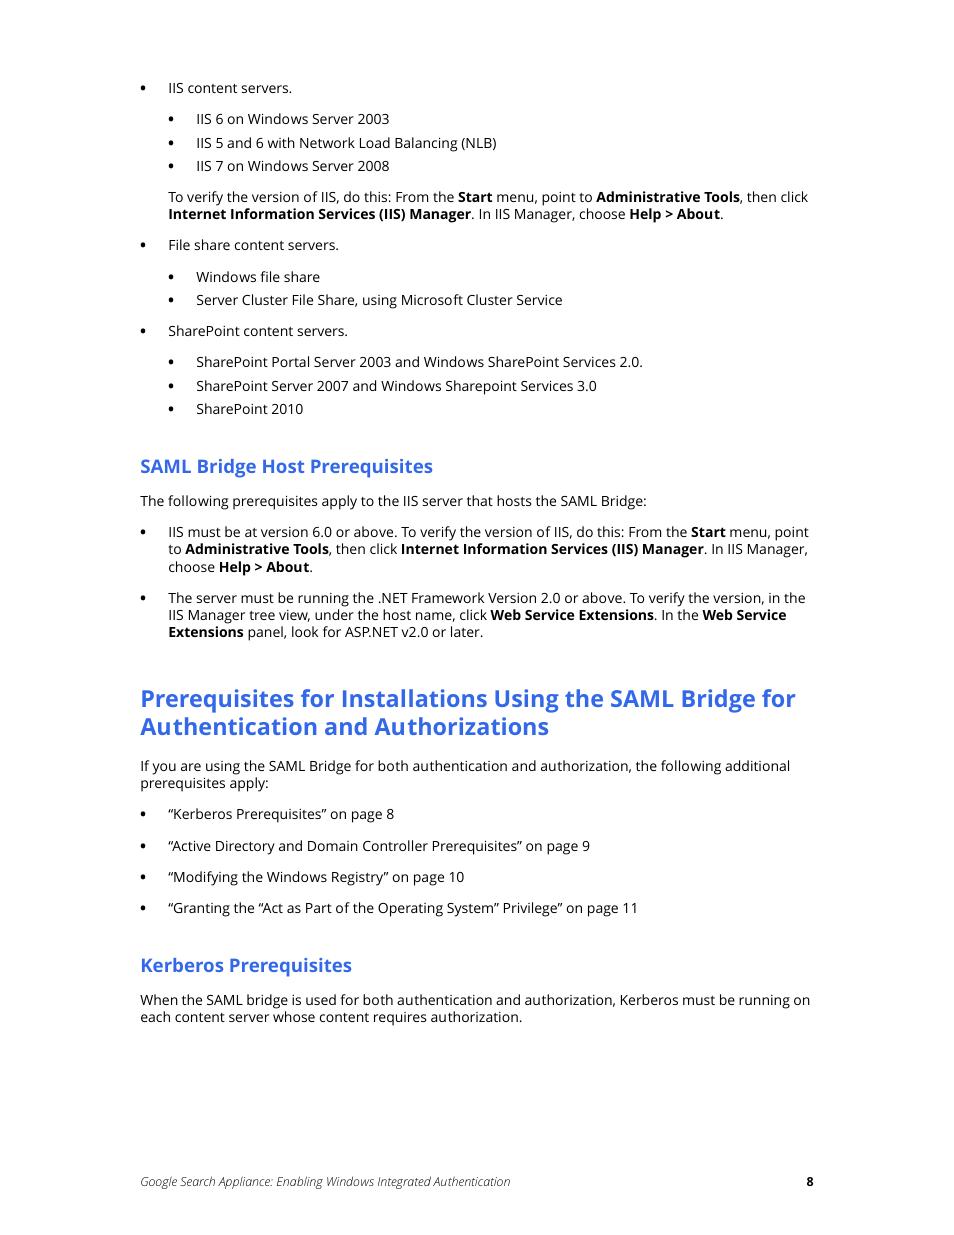 Saml bridge host prerequisites, Kerberos prerequisites